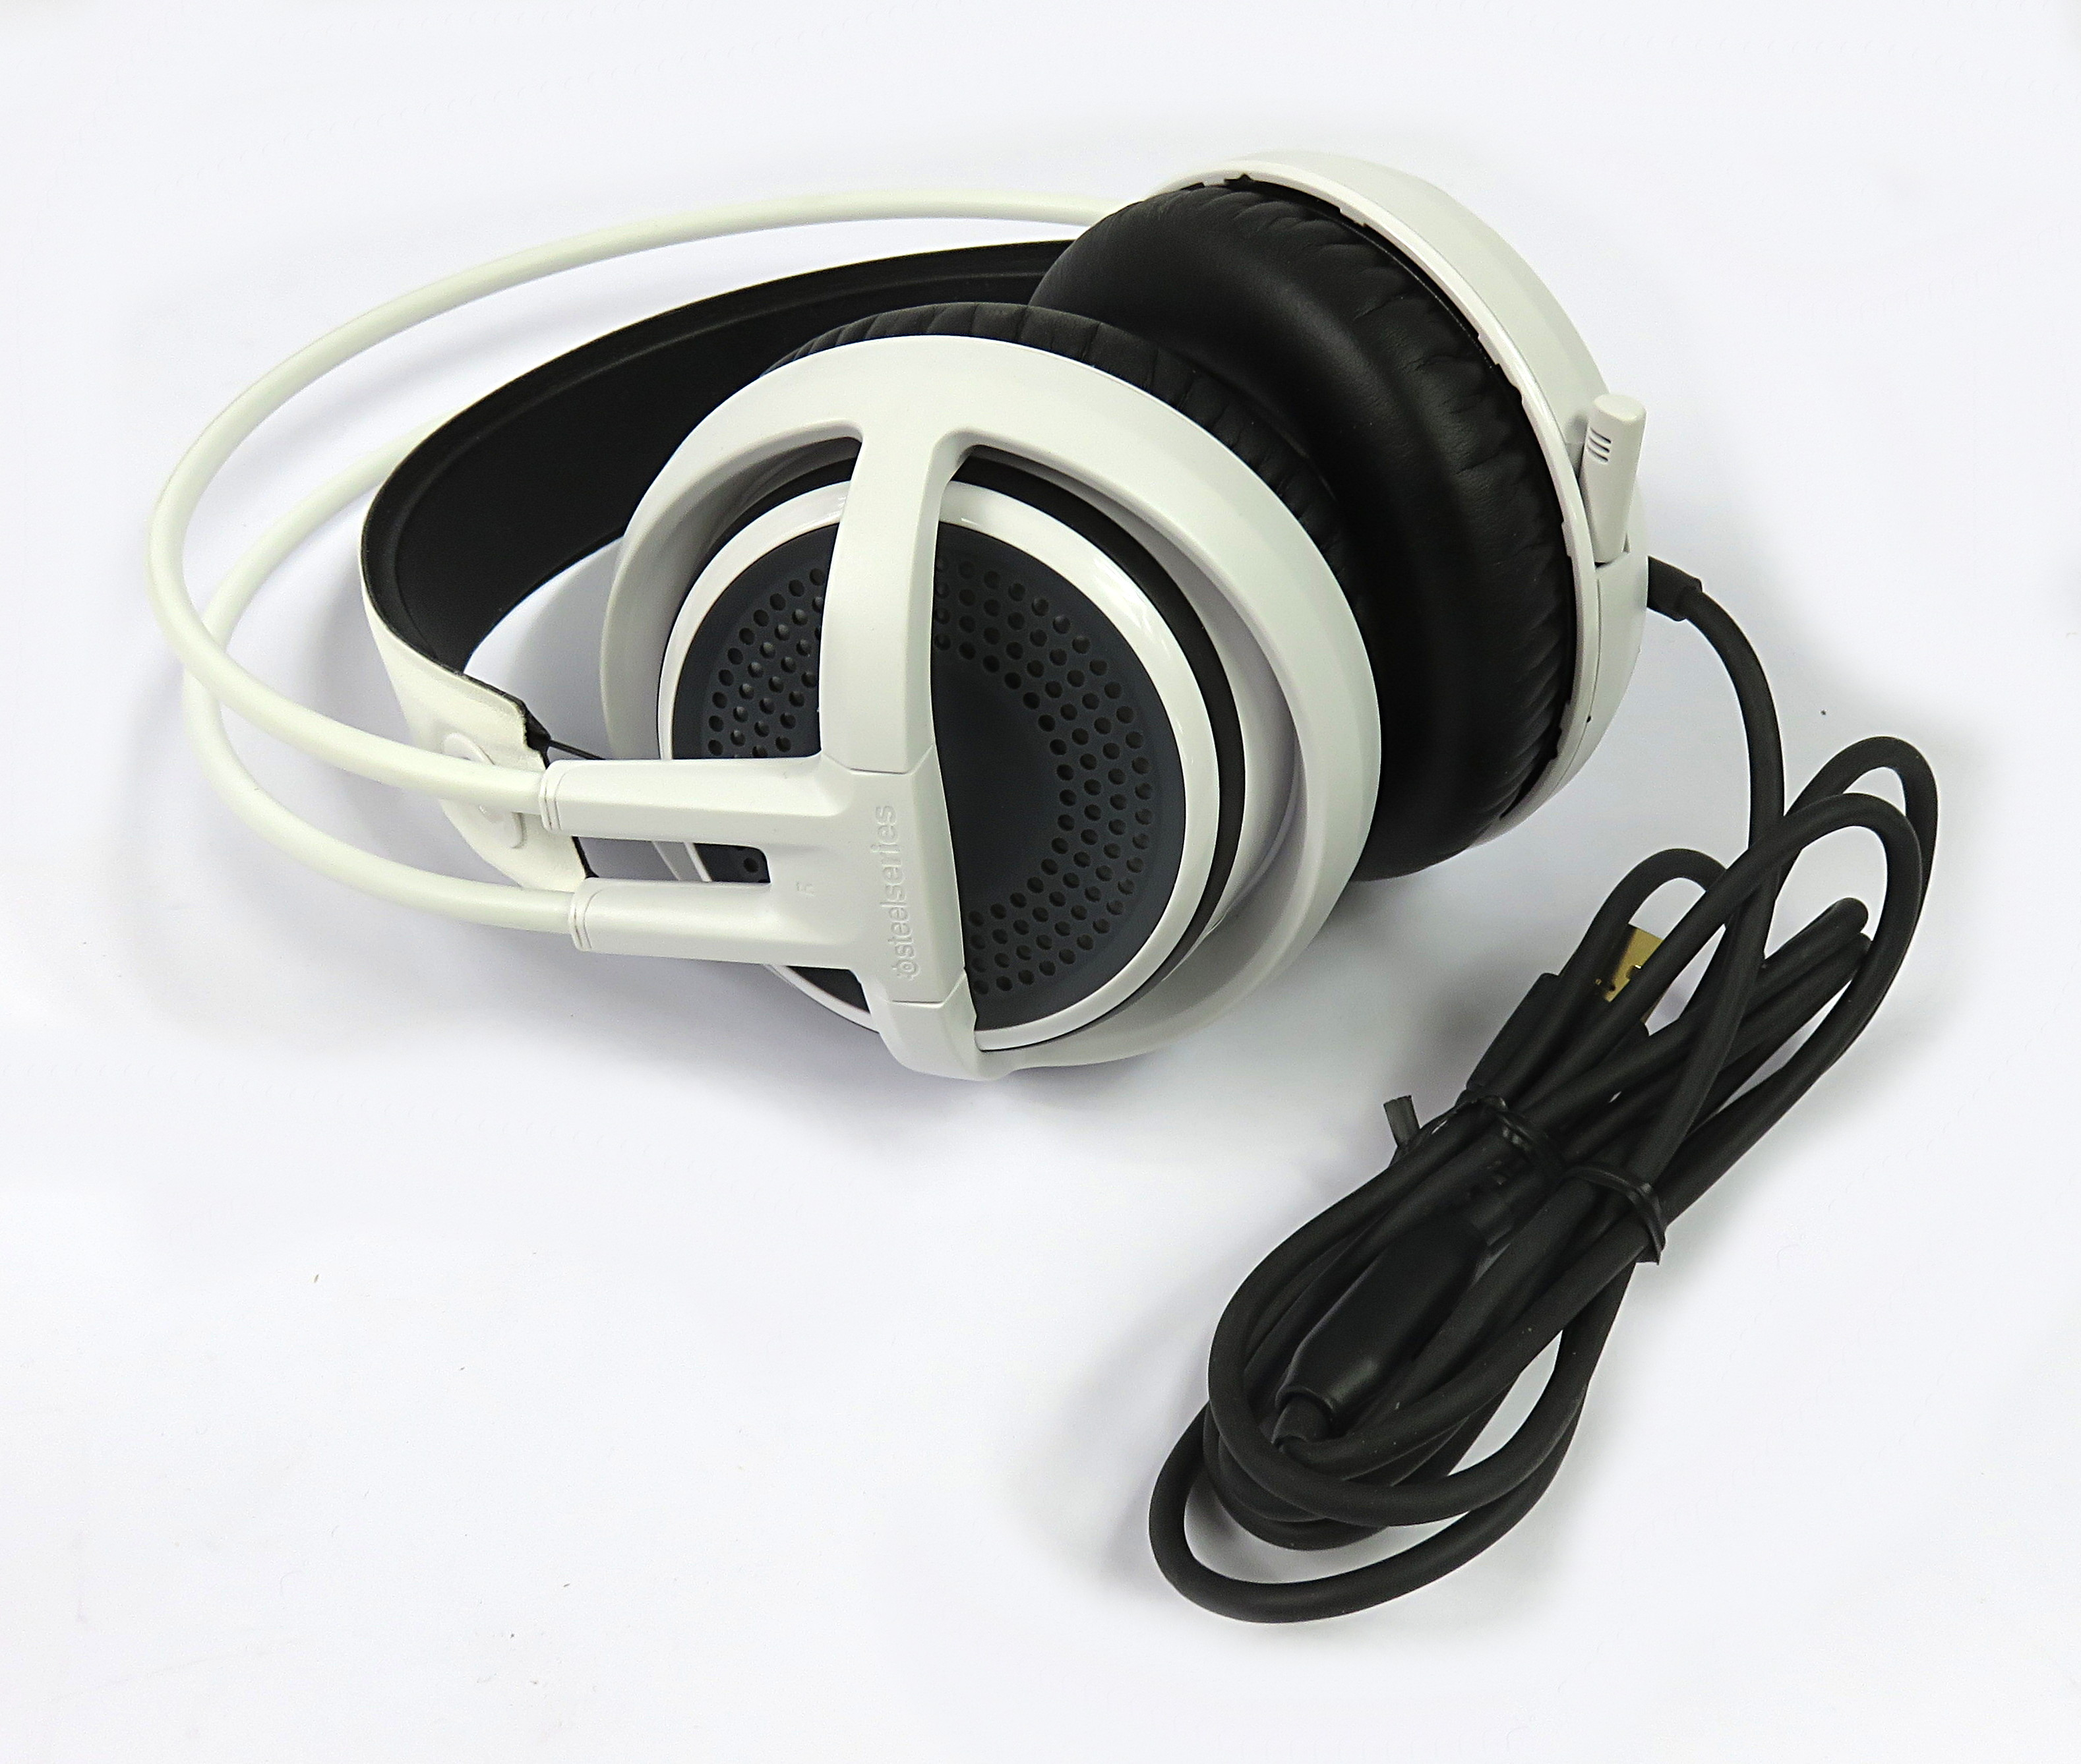 steelseries siberia 350 wired usb gaming headset 51204 w rgb lighting white headphones. Black Bedroom Furniture Sets. Home Design Ideas